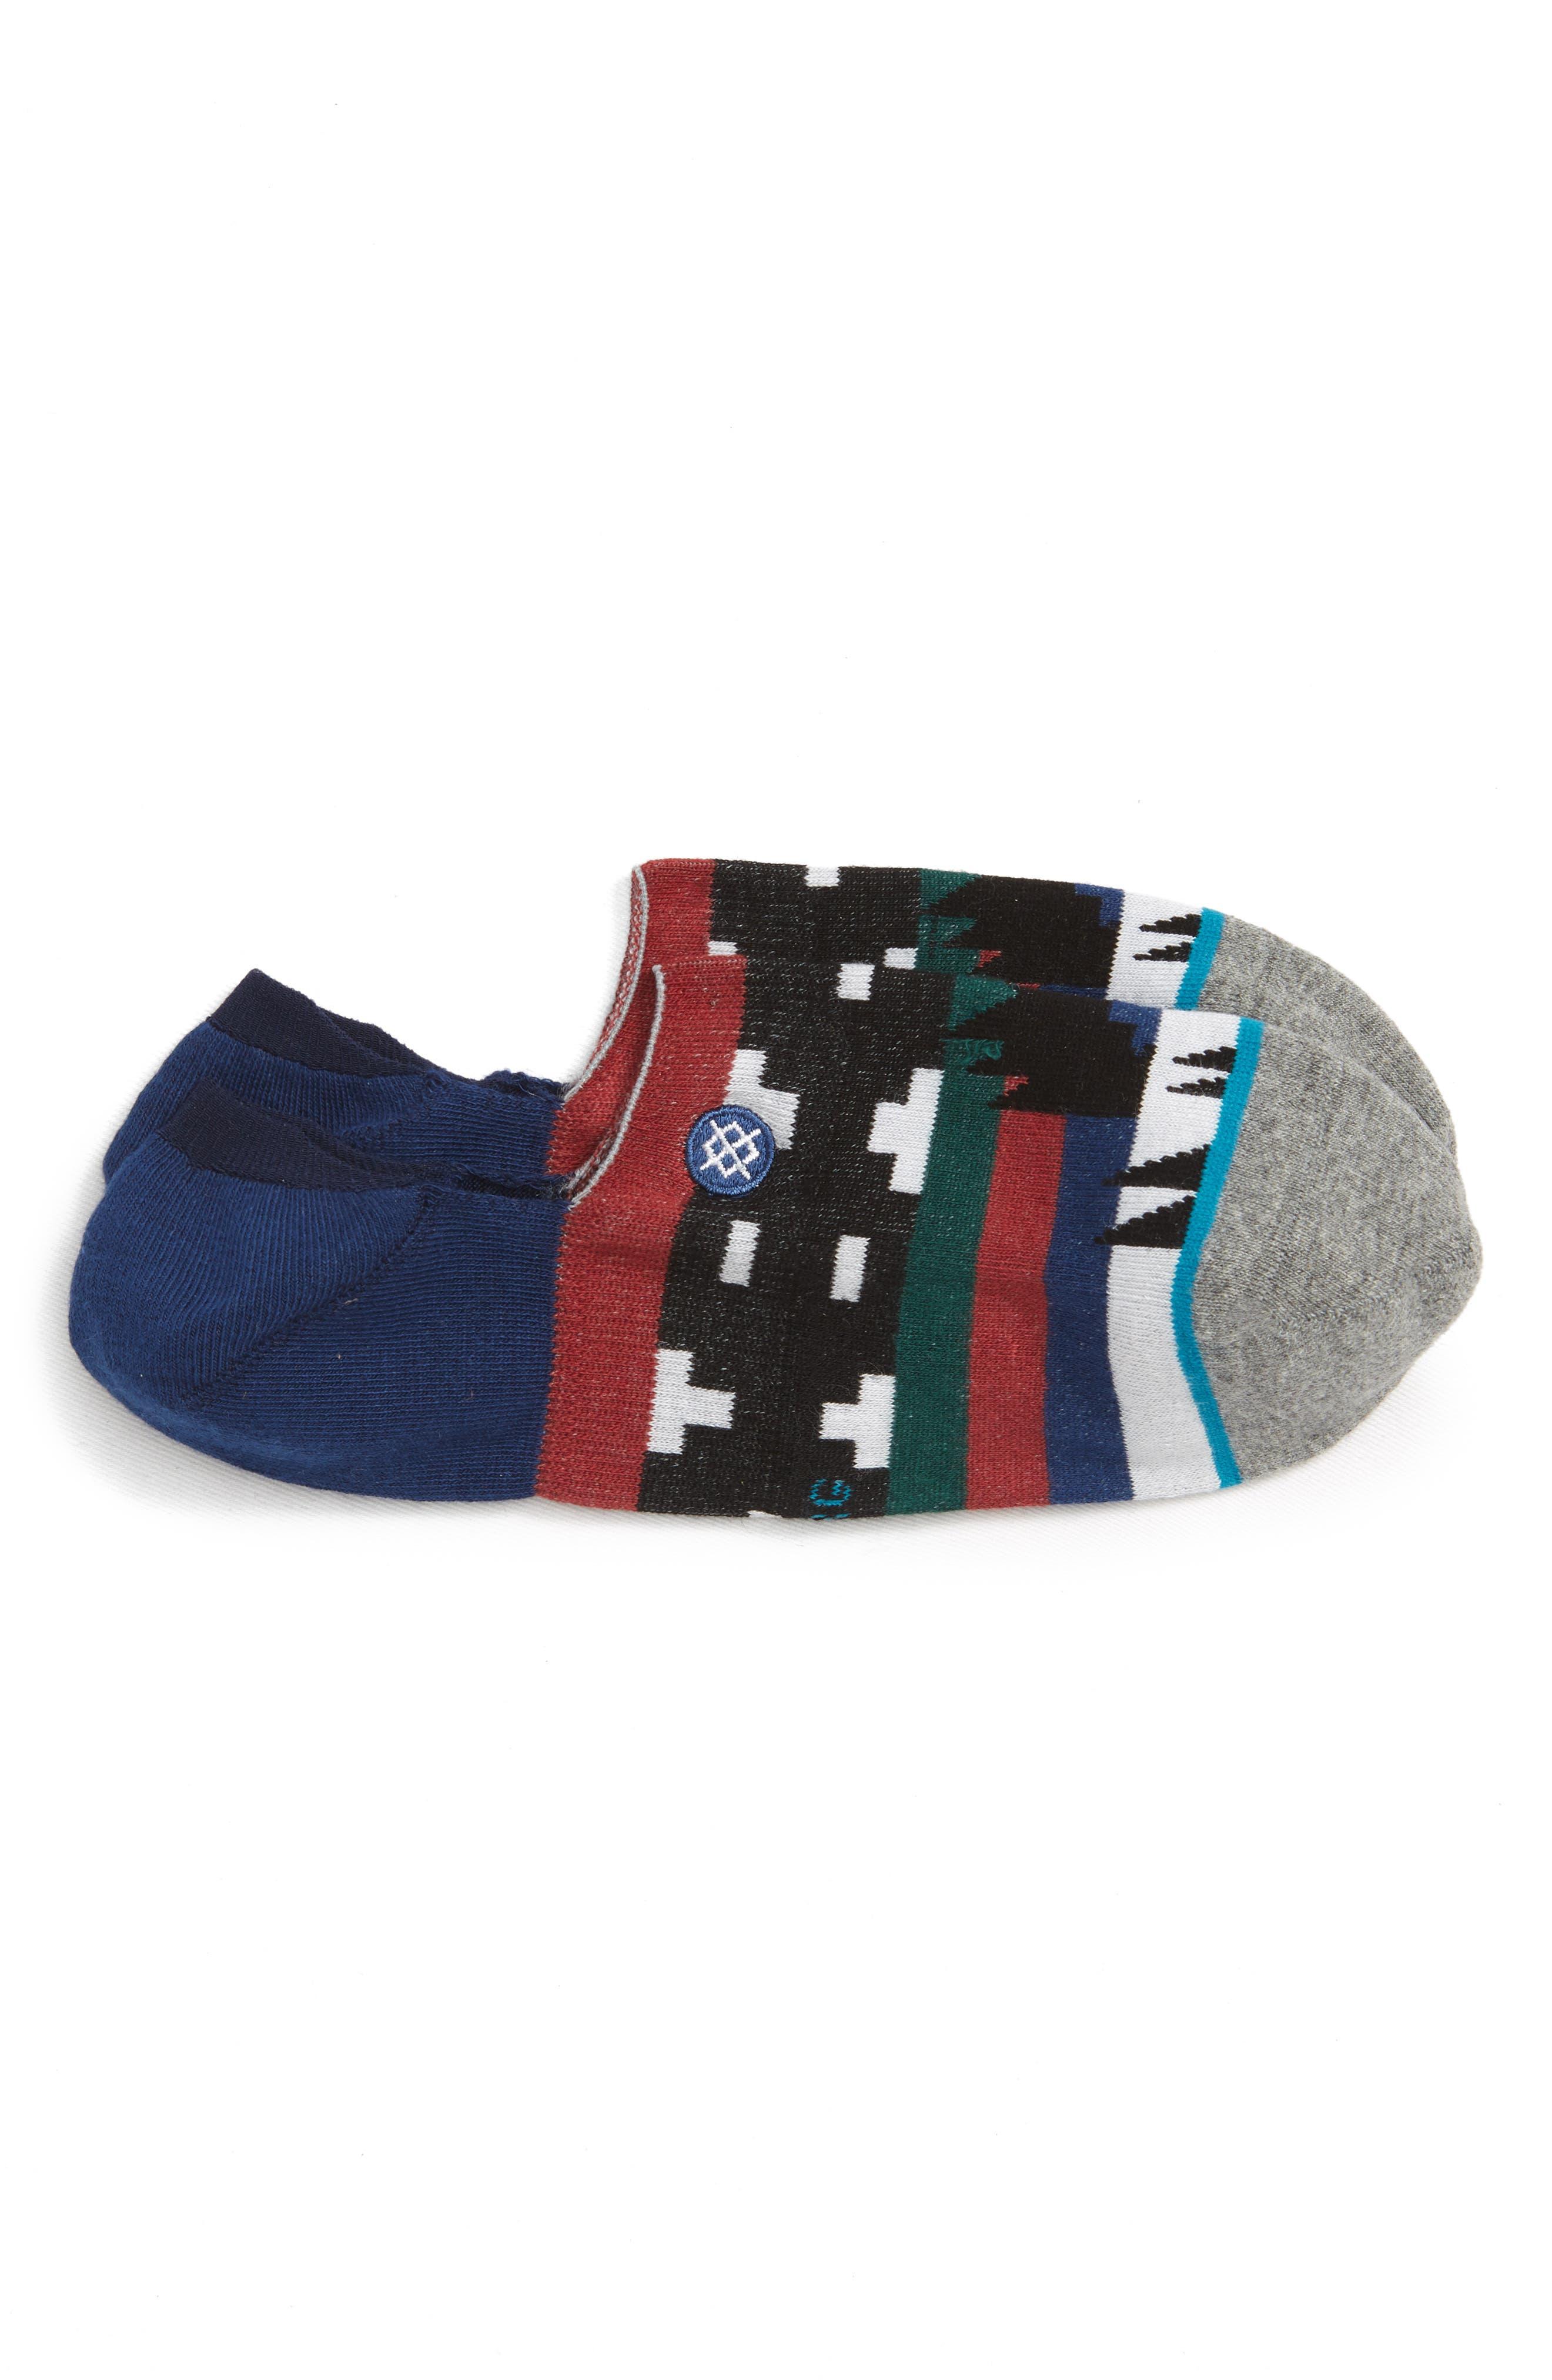 Waziatta Low Socks,                         Main,                         color, NAVY